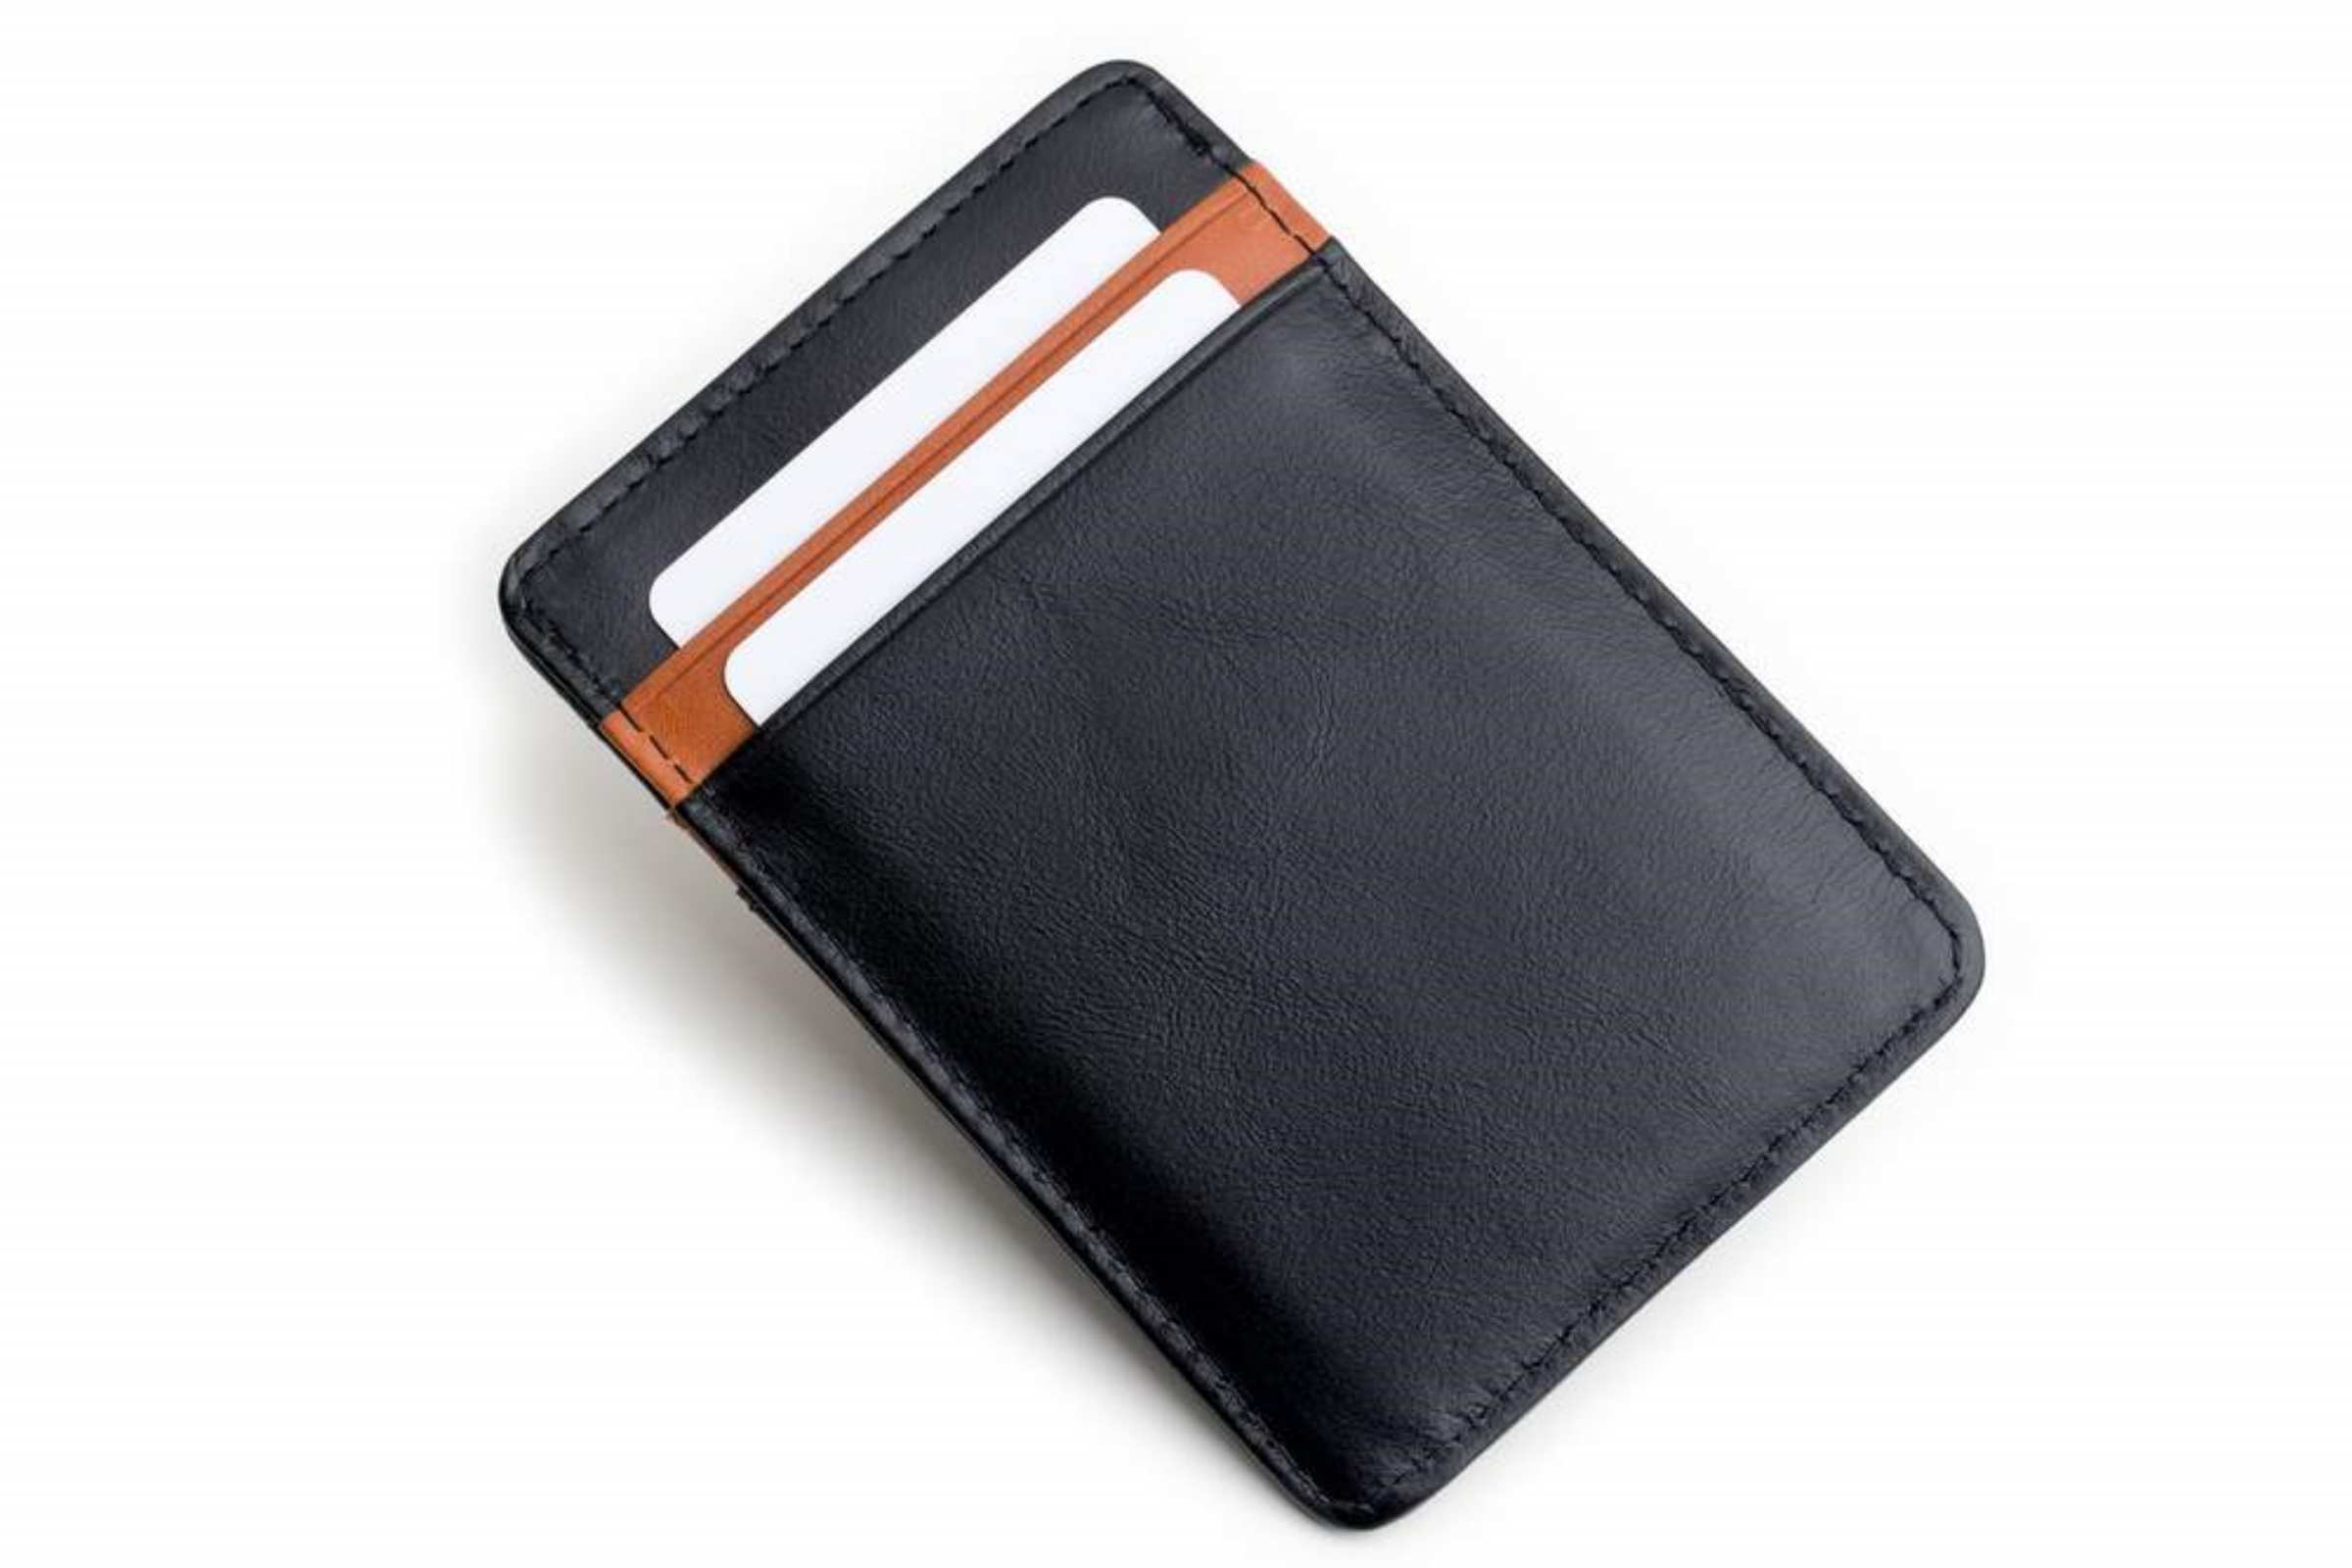 The light mens credit card business card walle tkarakoram2 leather back cards